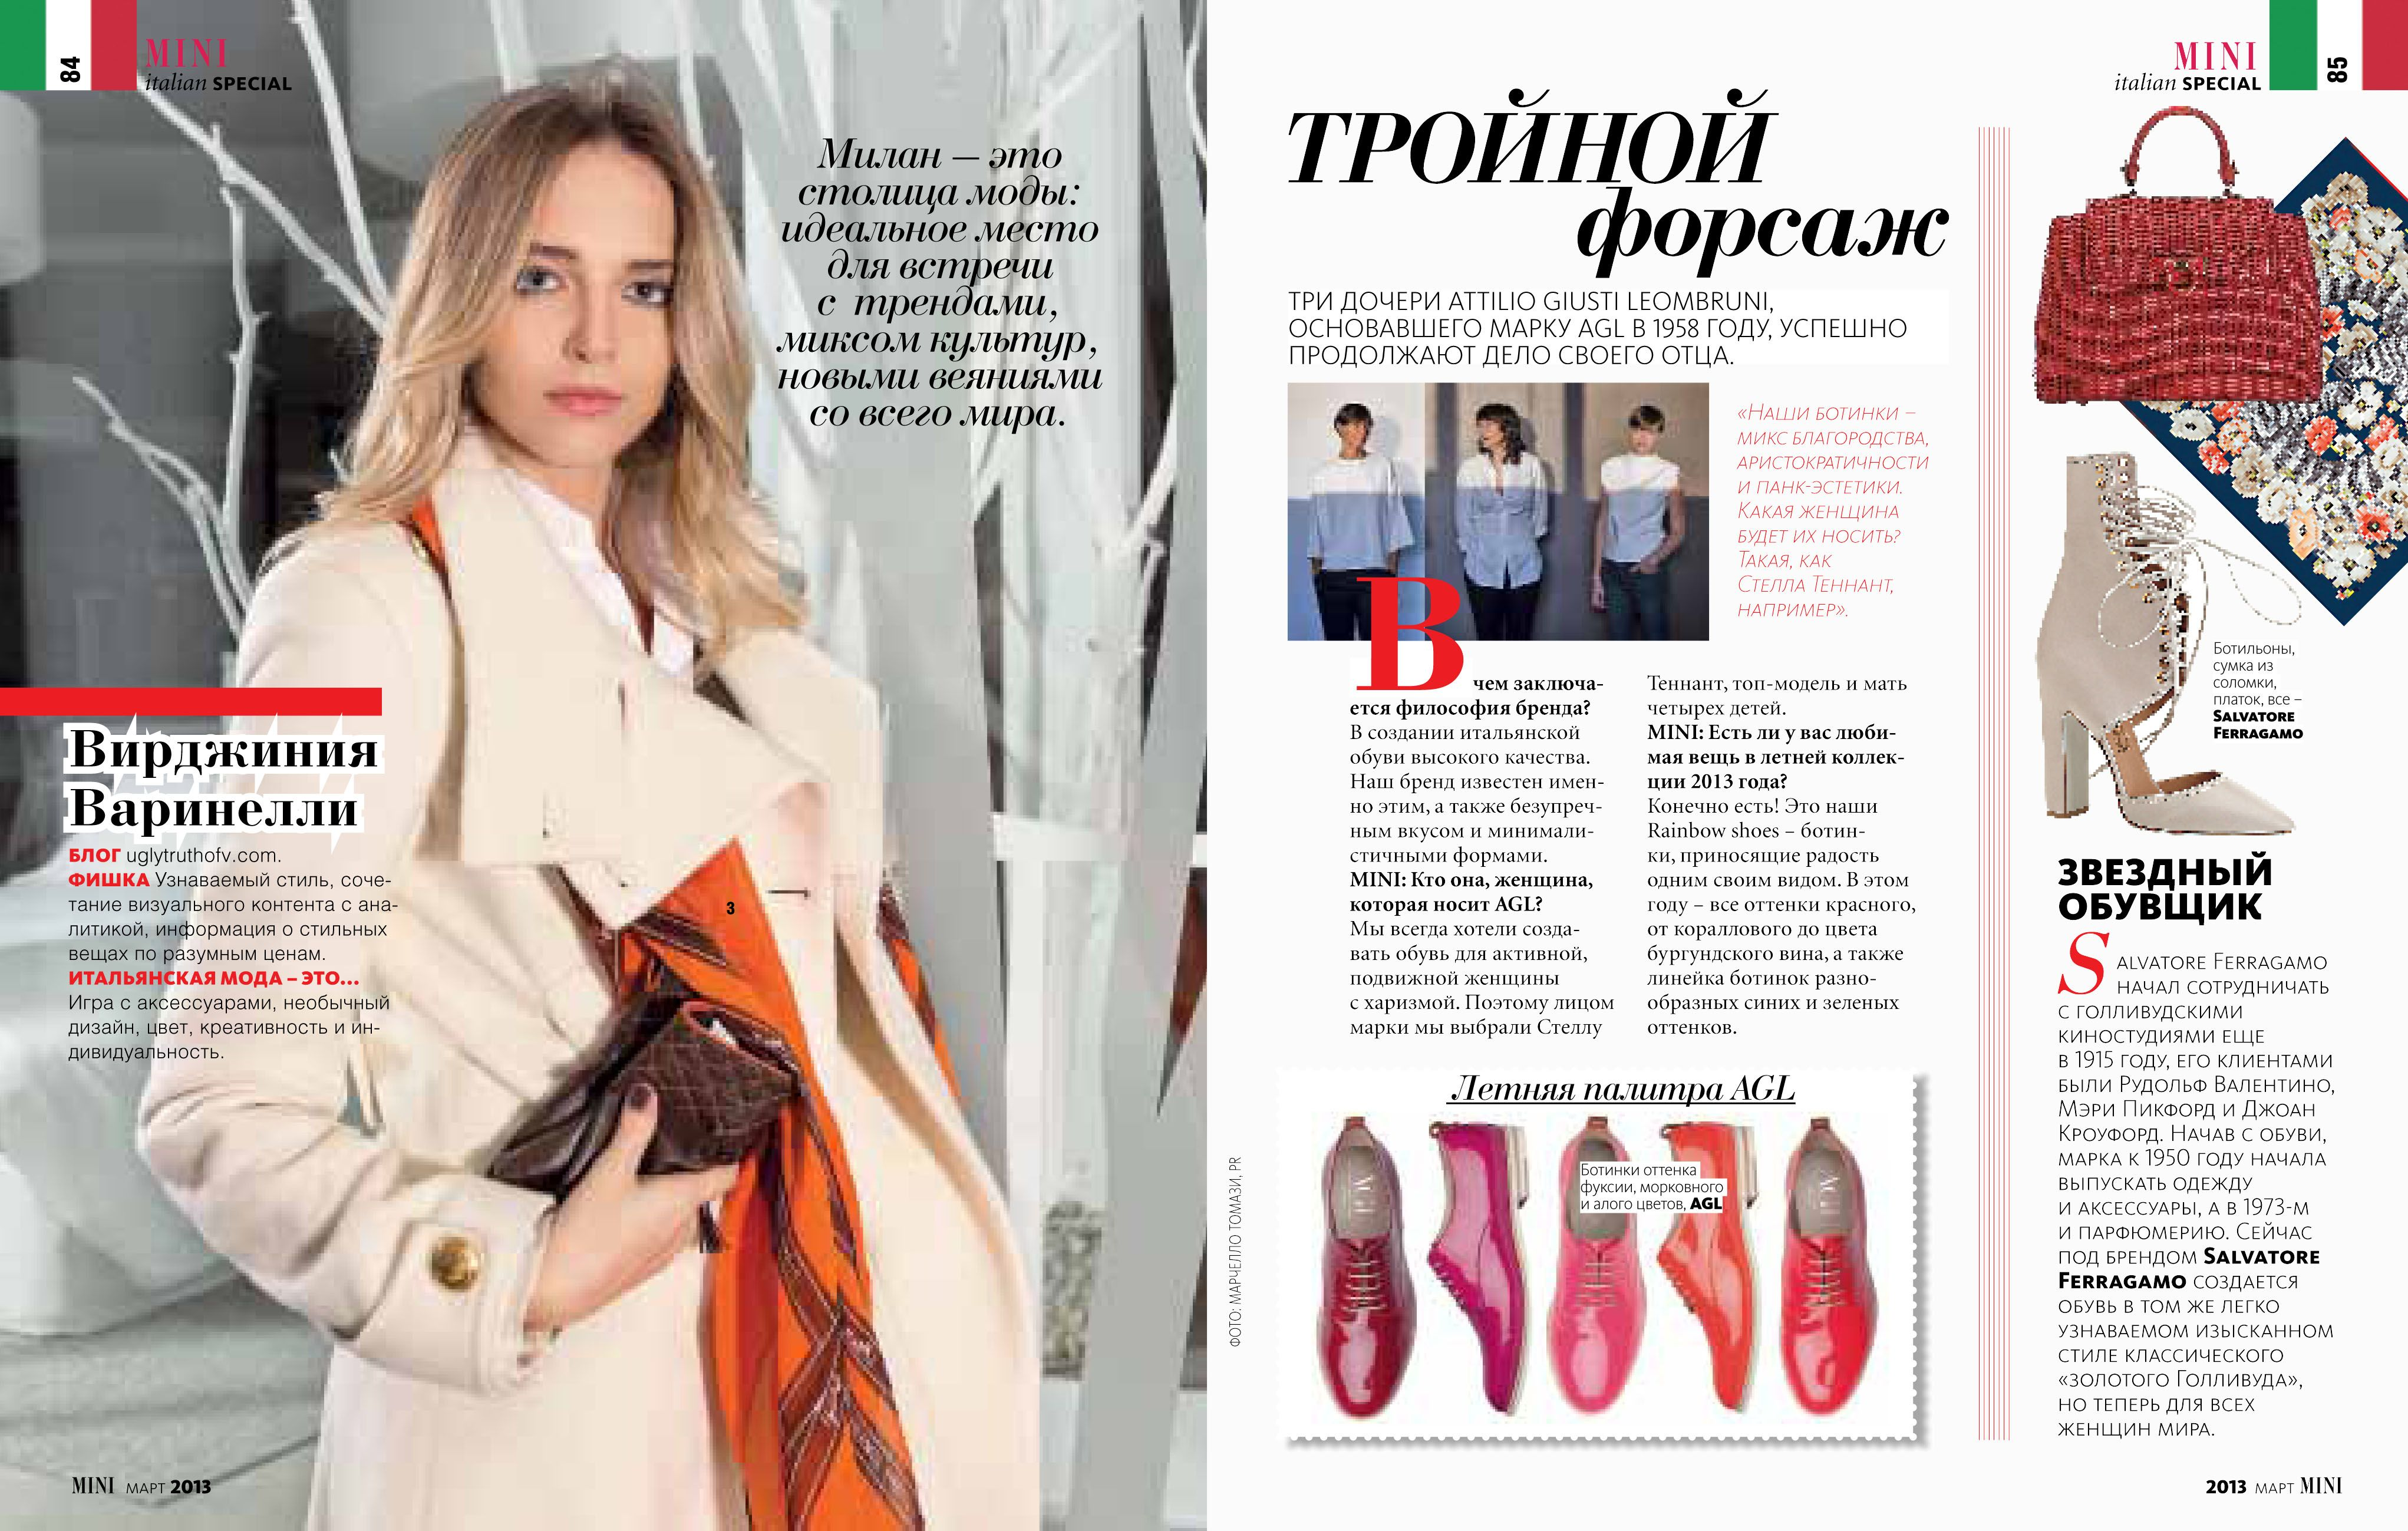 http://www.uglytruthofv.com/2013/02/05/interview-for-mini-magazine-russia/